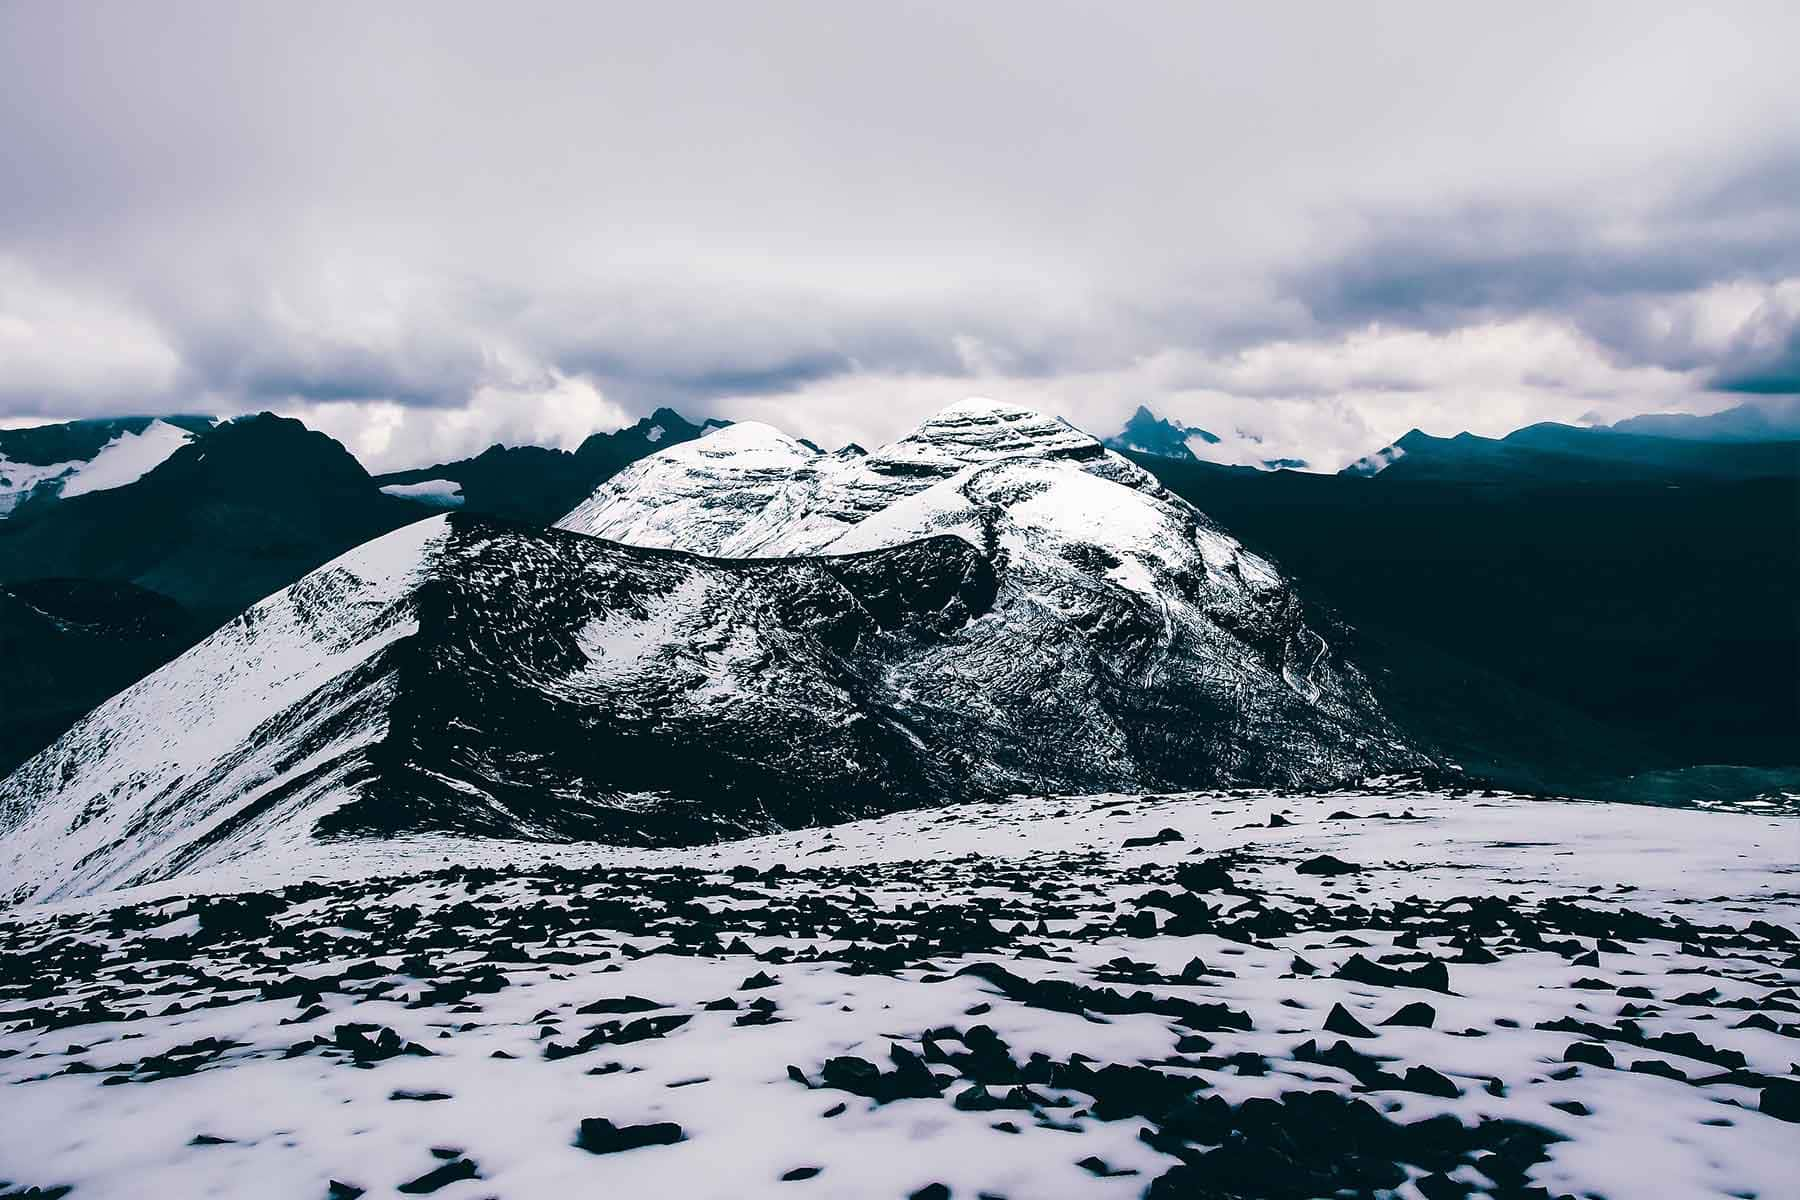 Resor-till-Bolivia-med-Nygren-&-Lind-Resebyrå---bergstoppar